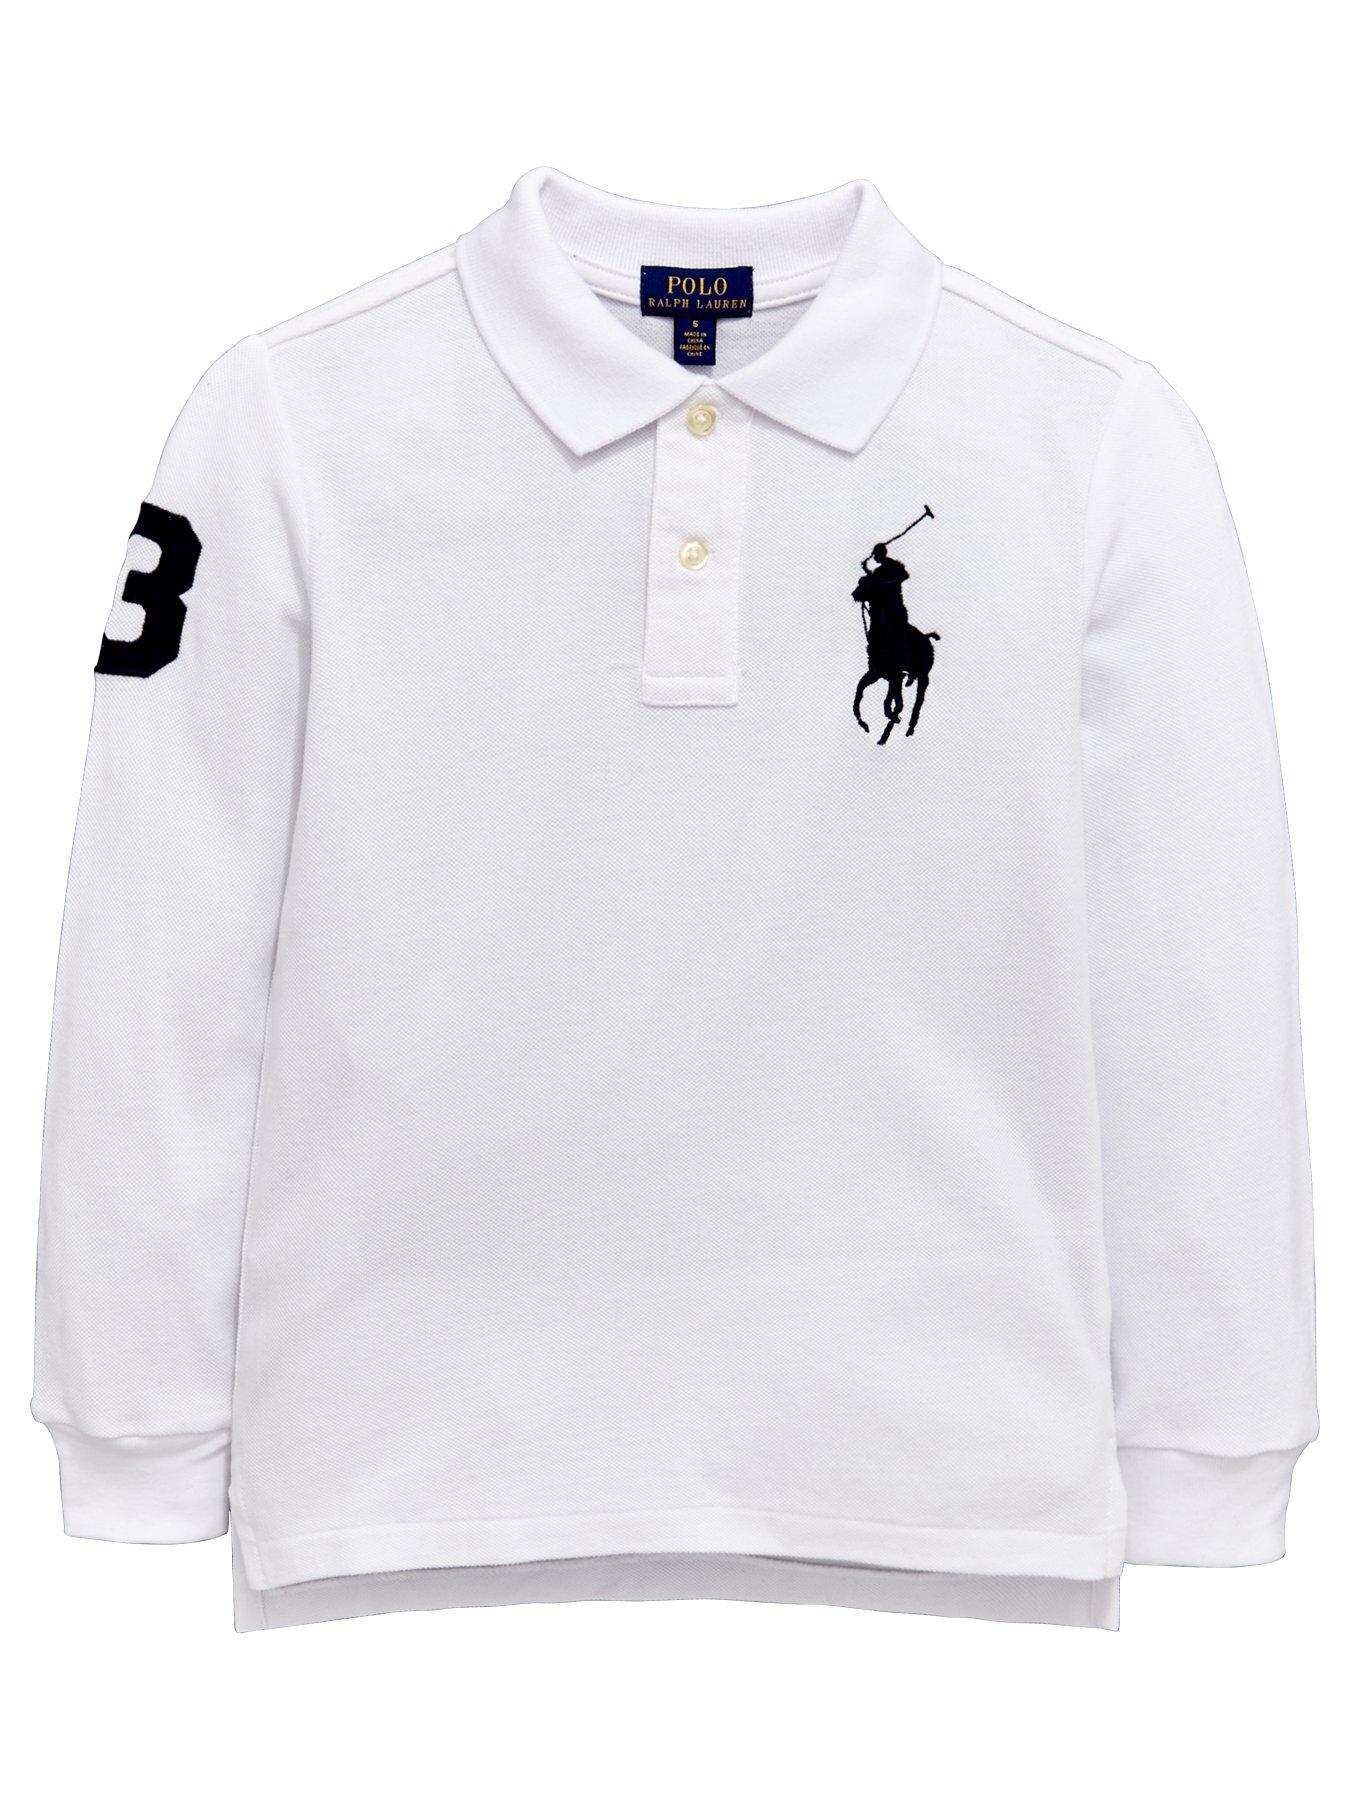 T Size Shirts Large Ralph Extra Mens Online Lauren Shop 1KTl3JcF